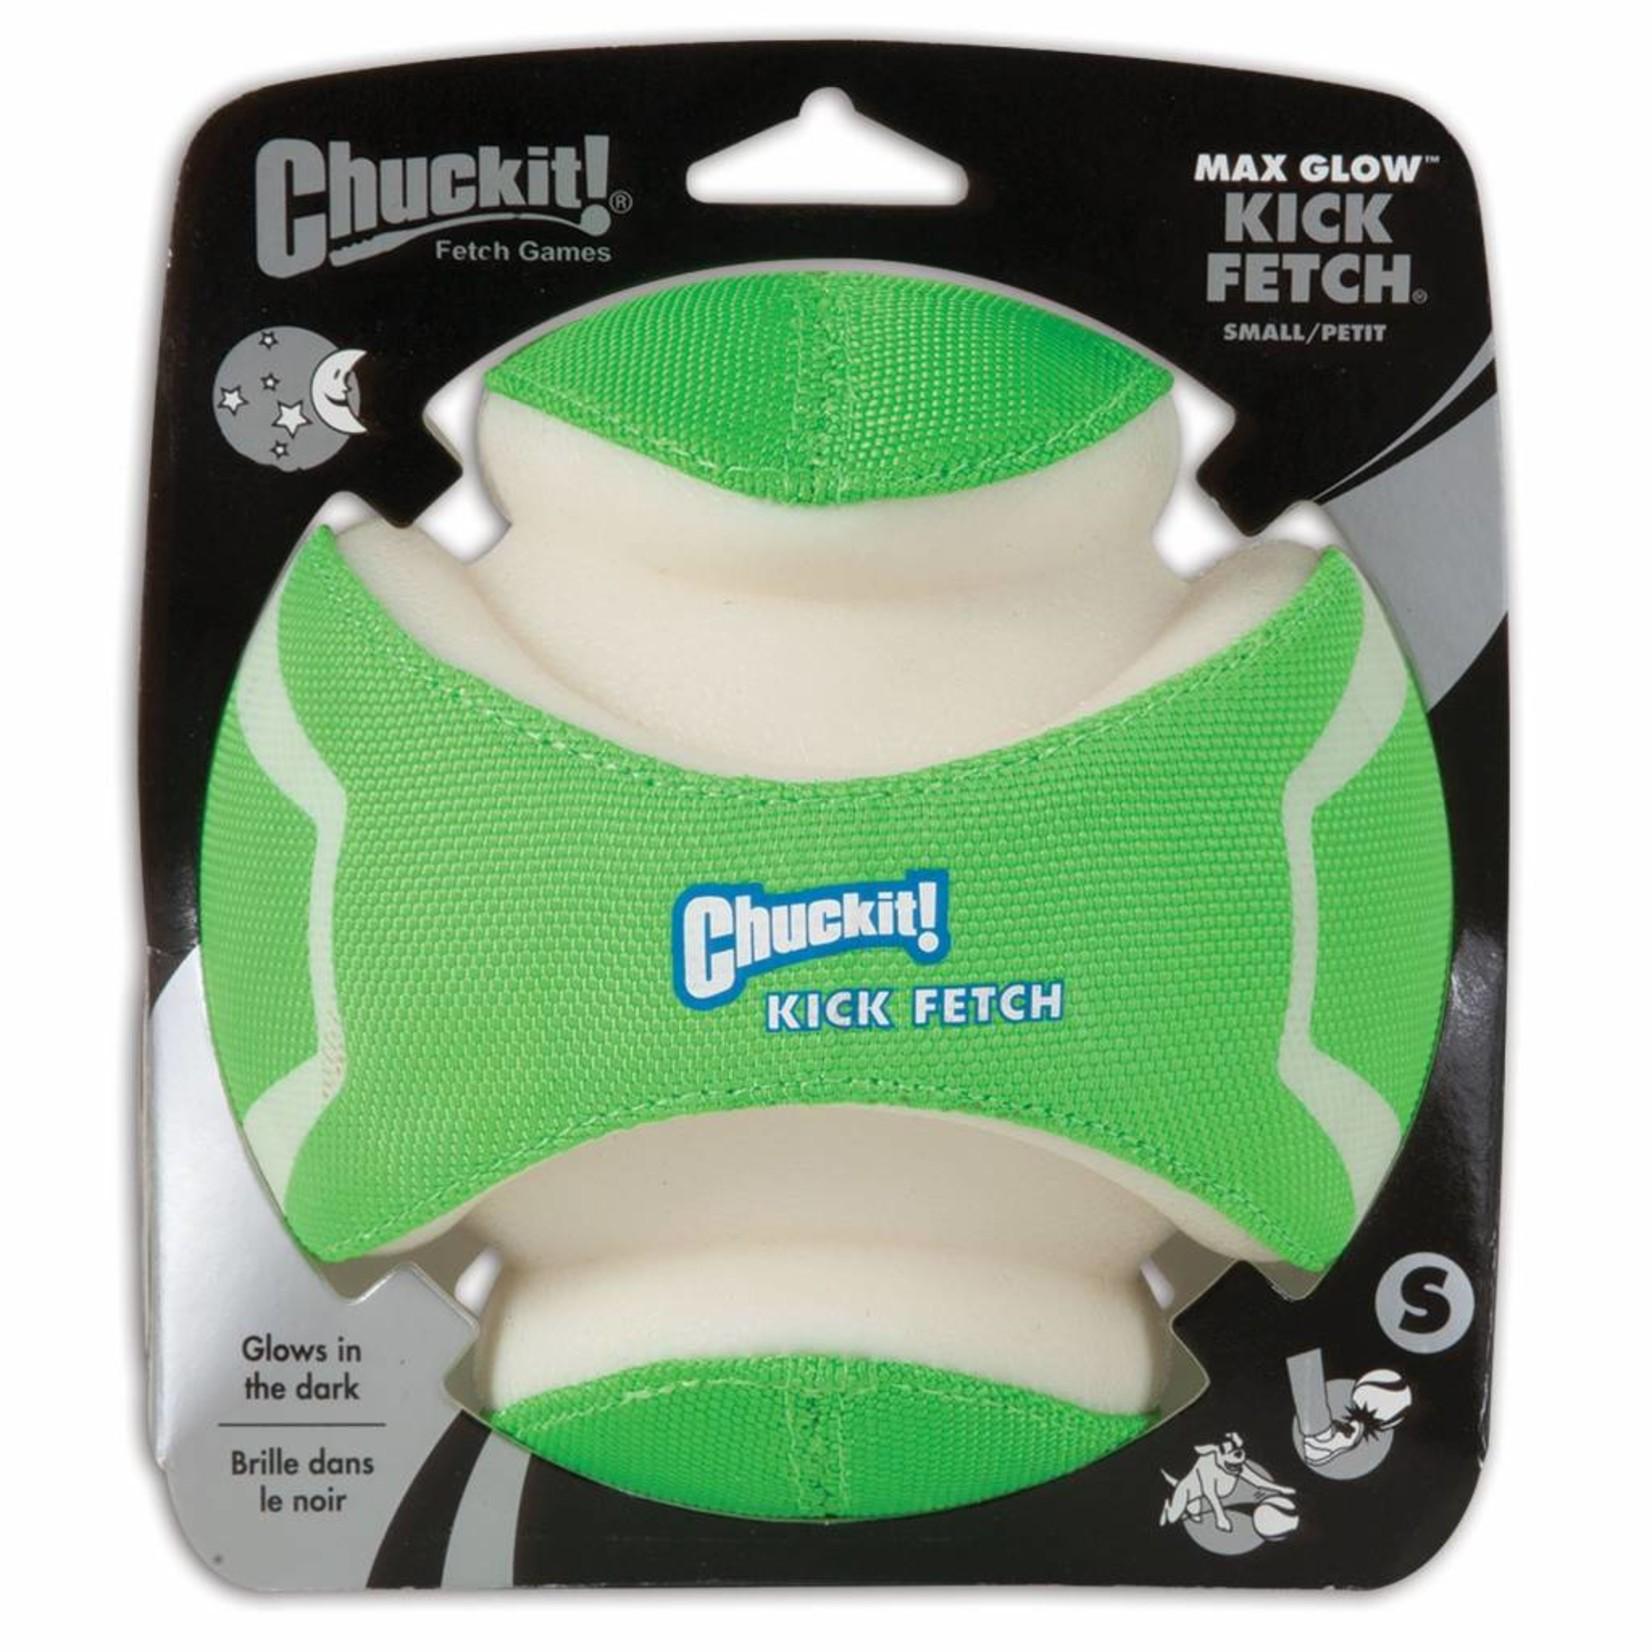 Chuckit! Light Play Kick Fetch Dog Toy